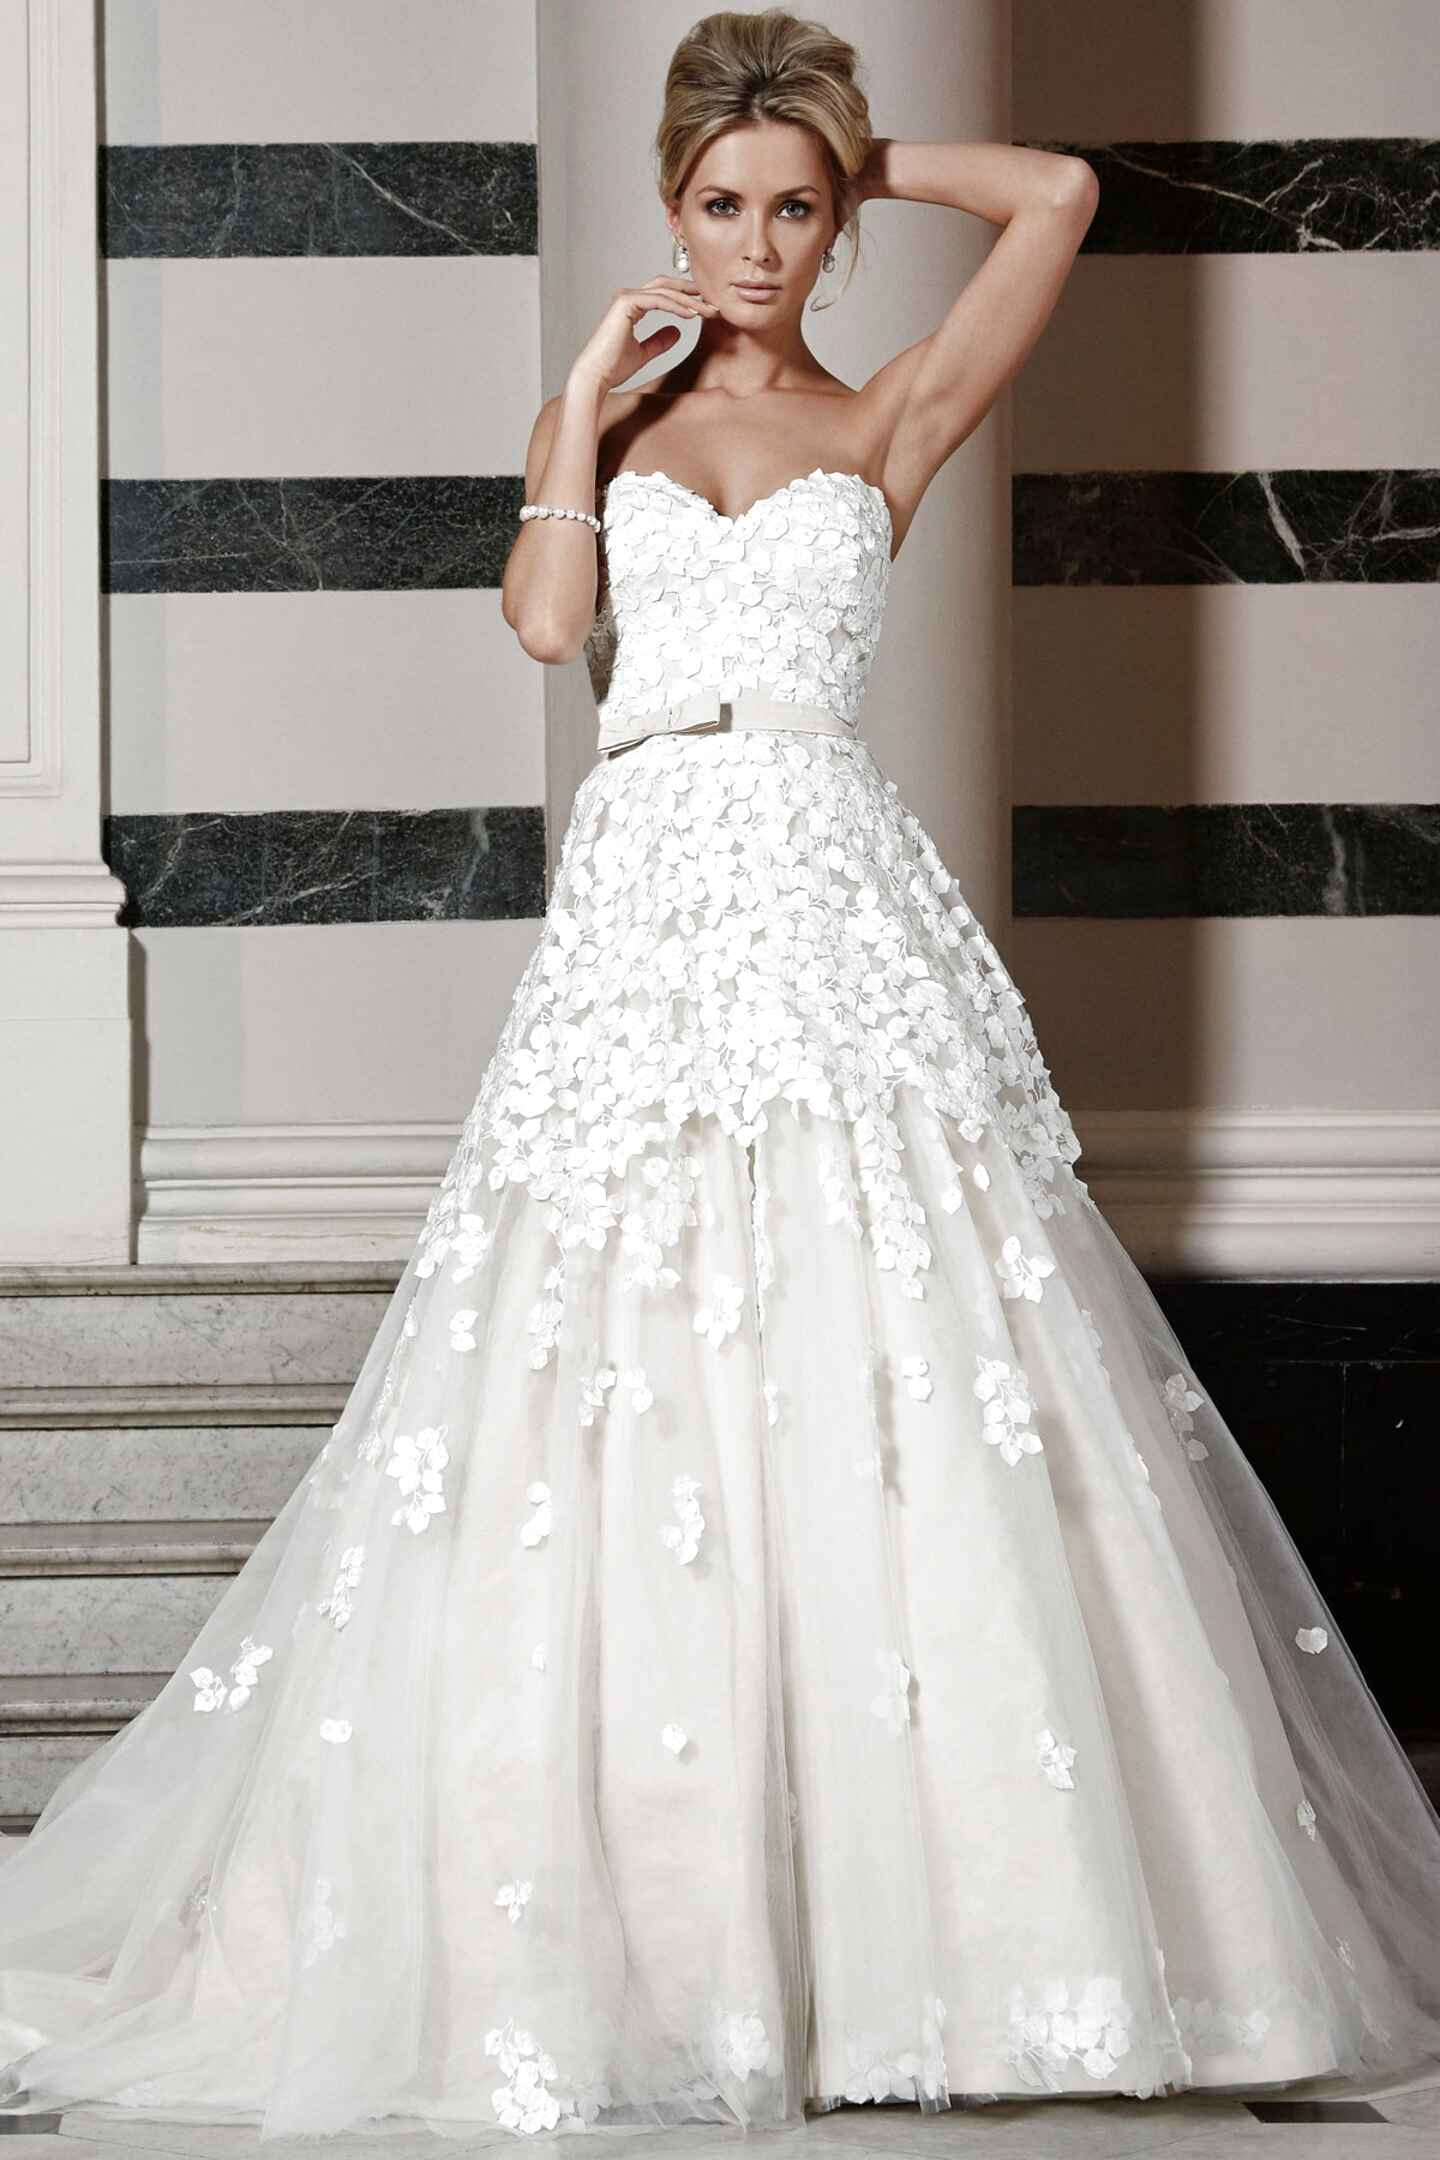 ian stuart wedding dress for sale